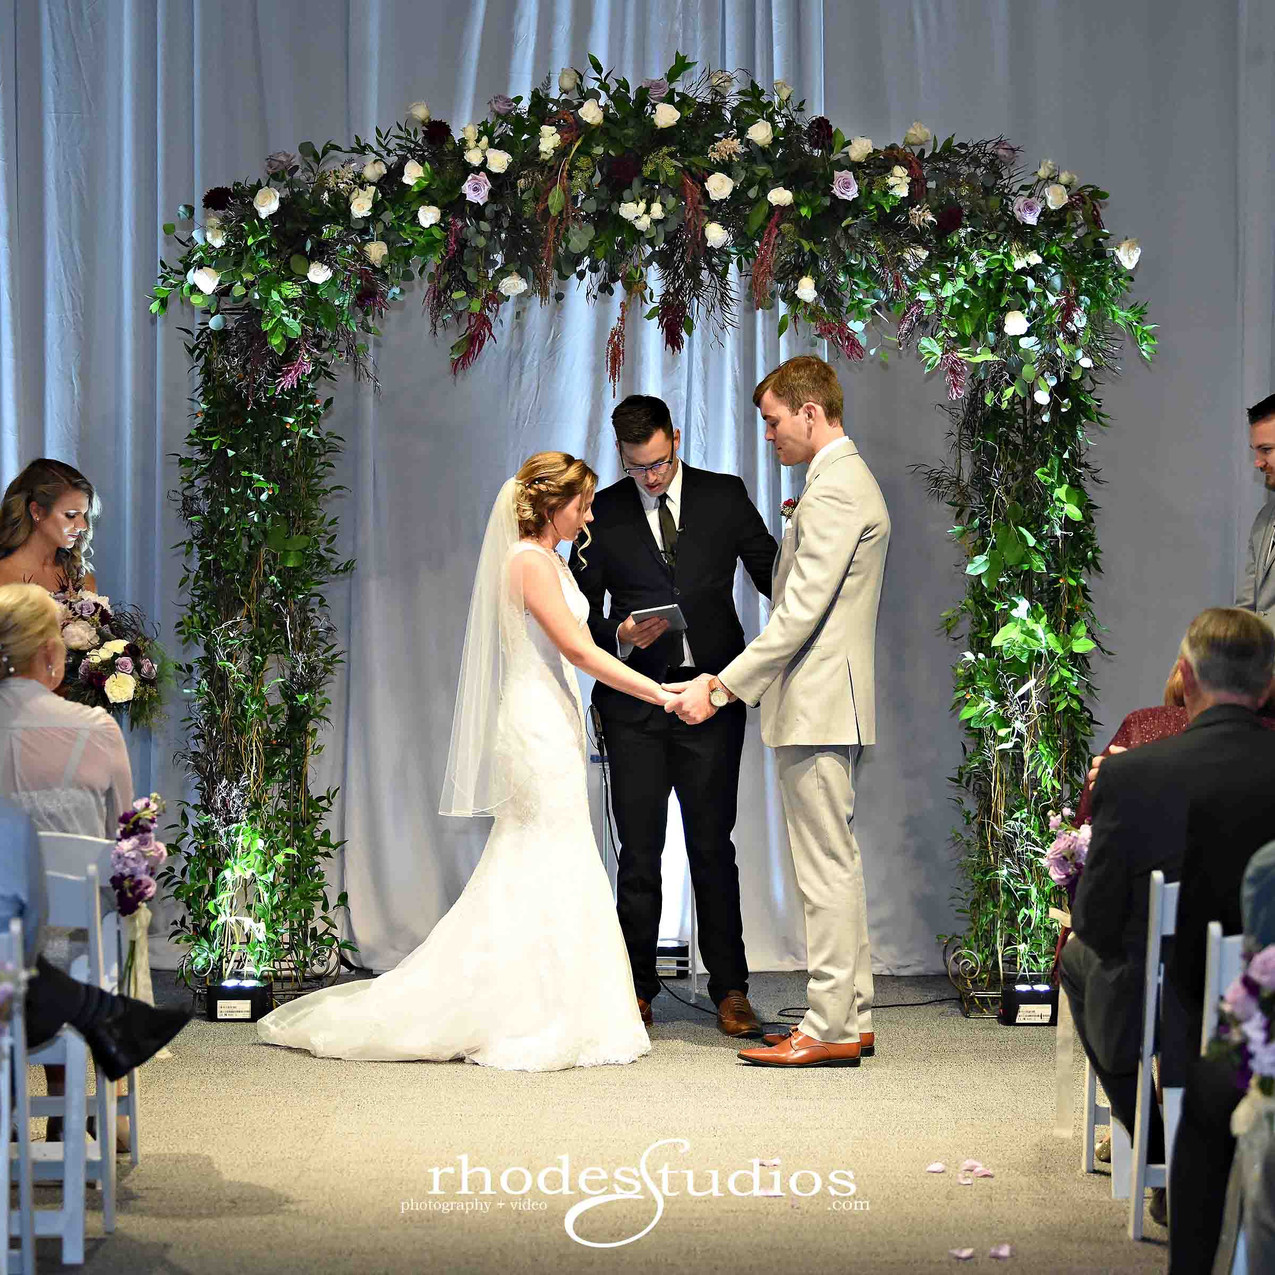 Beautiful romantic ceremony